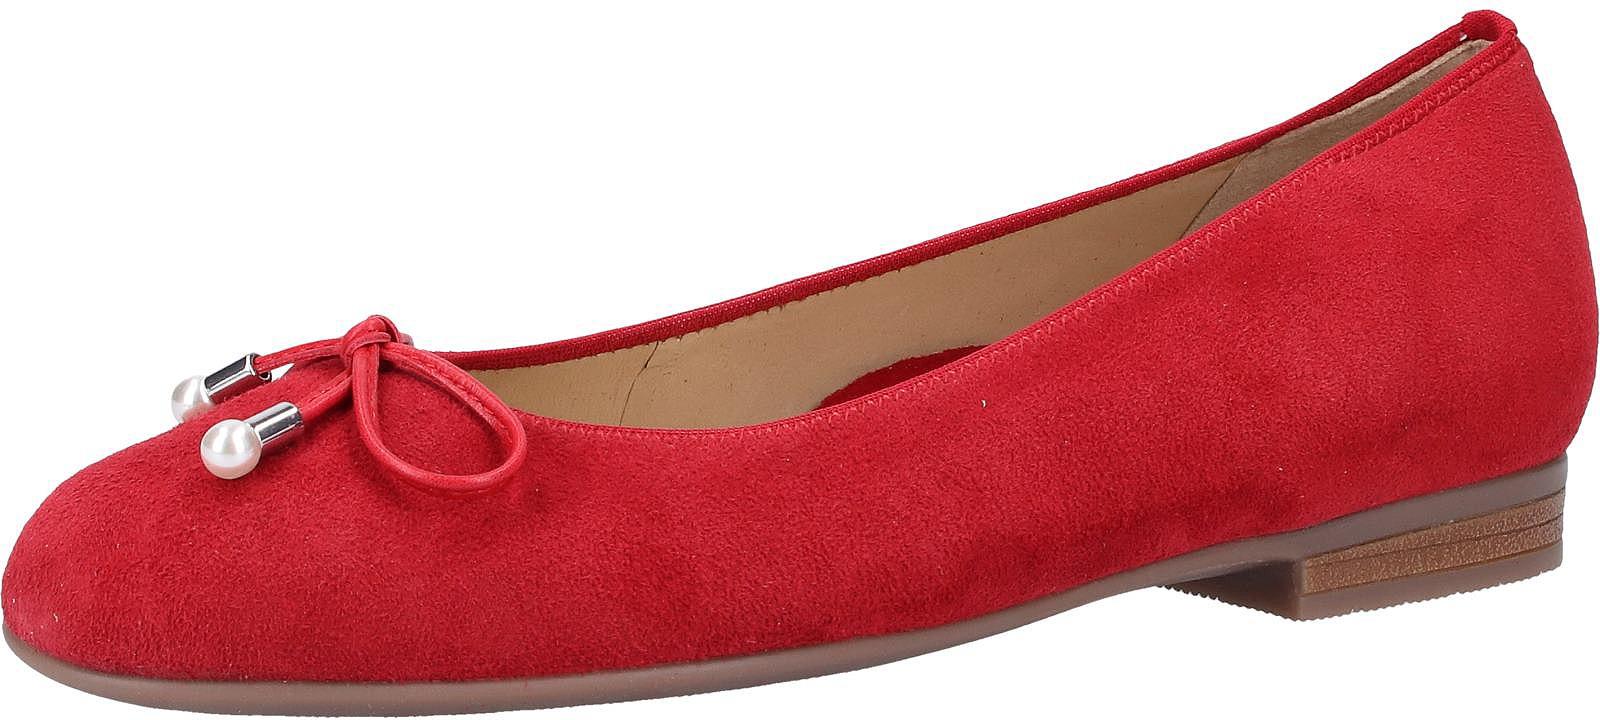 Ara Ballerina Leder rot Damen Ballerinas Schuhe